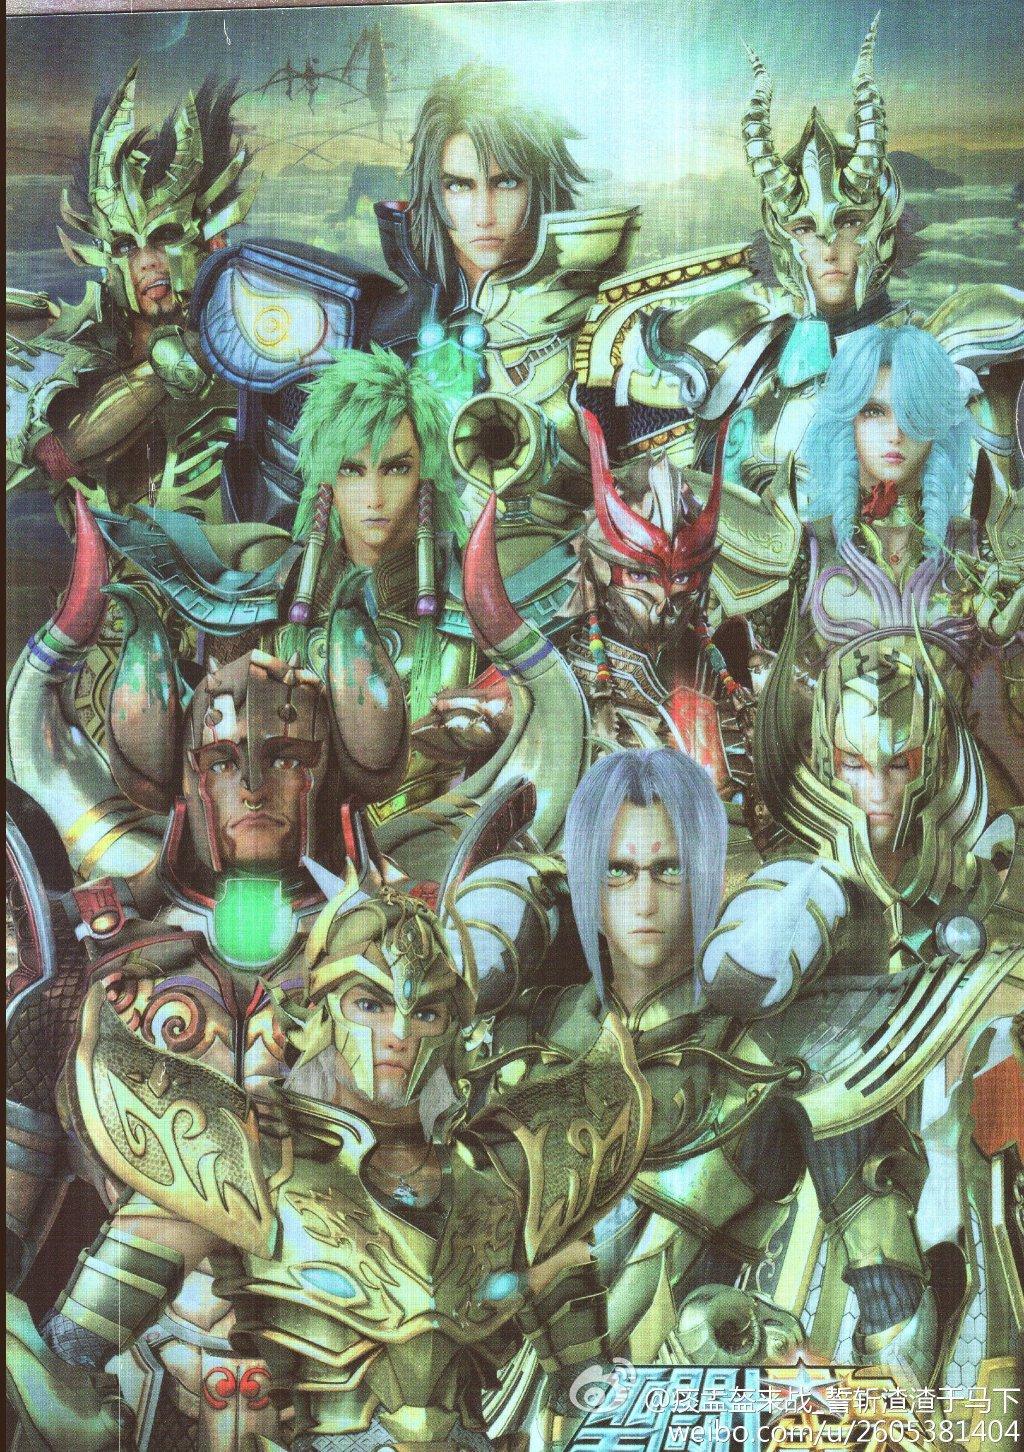 Saint Seiya - The Legend of Sanctuary TpkLeKJ0